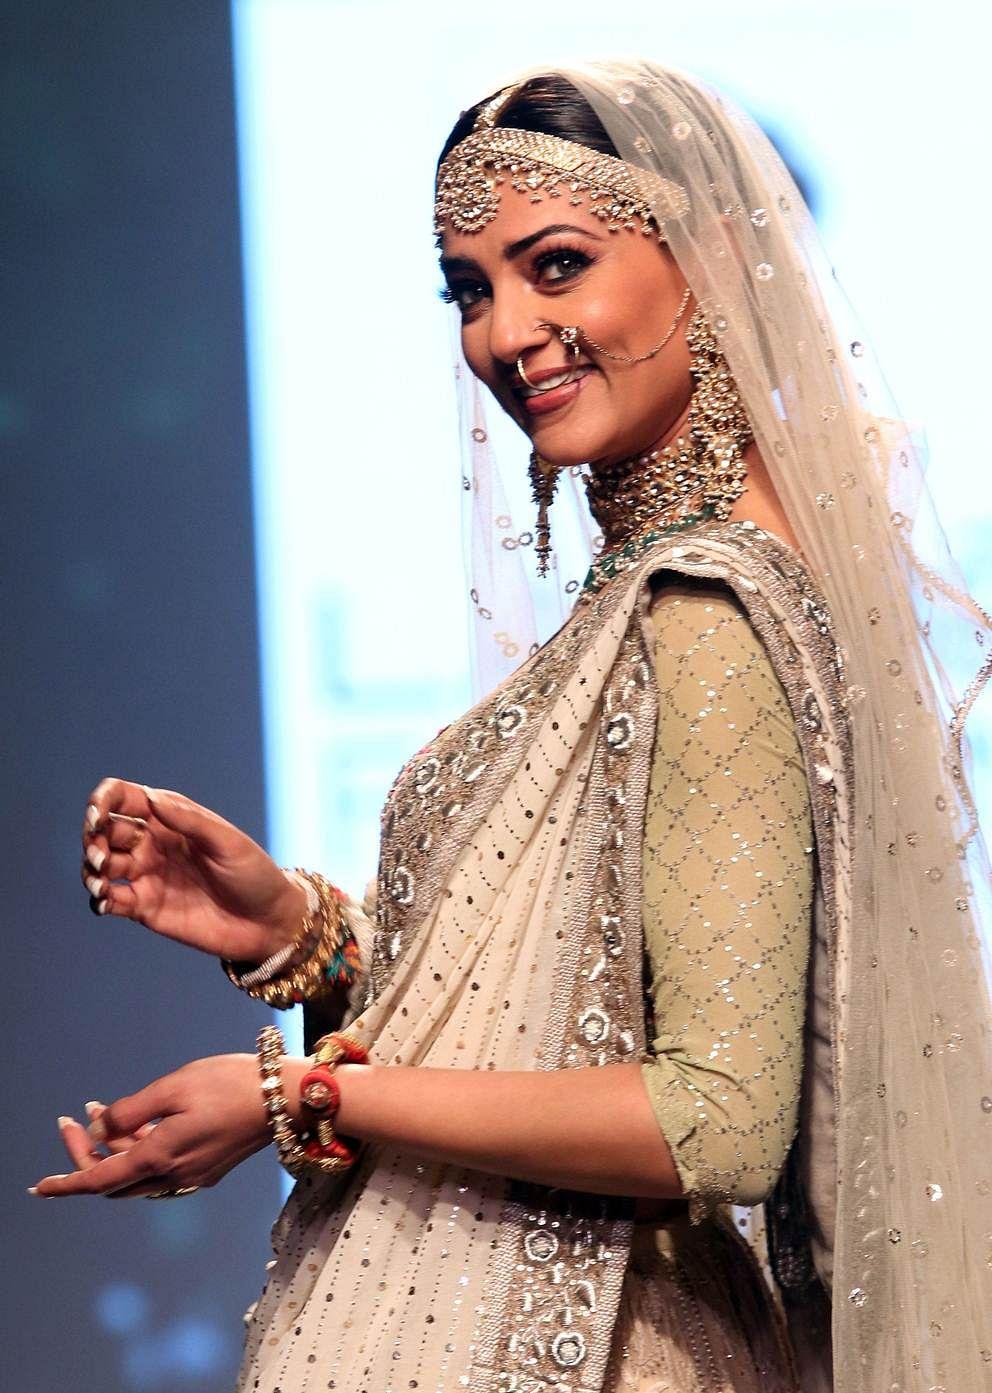 Indian Bollywood actress Sushmita Sen showcases a creation by designer Kotwara at the Lakmé Fashion Week (LFW) Summer Resort 2018 in Mumbai on February 3, 2018. / AFP PHOTO / Sujit Jaiswal